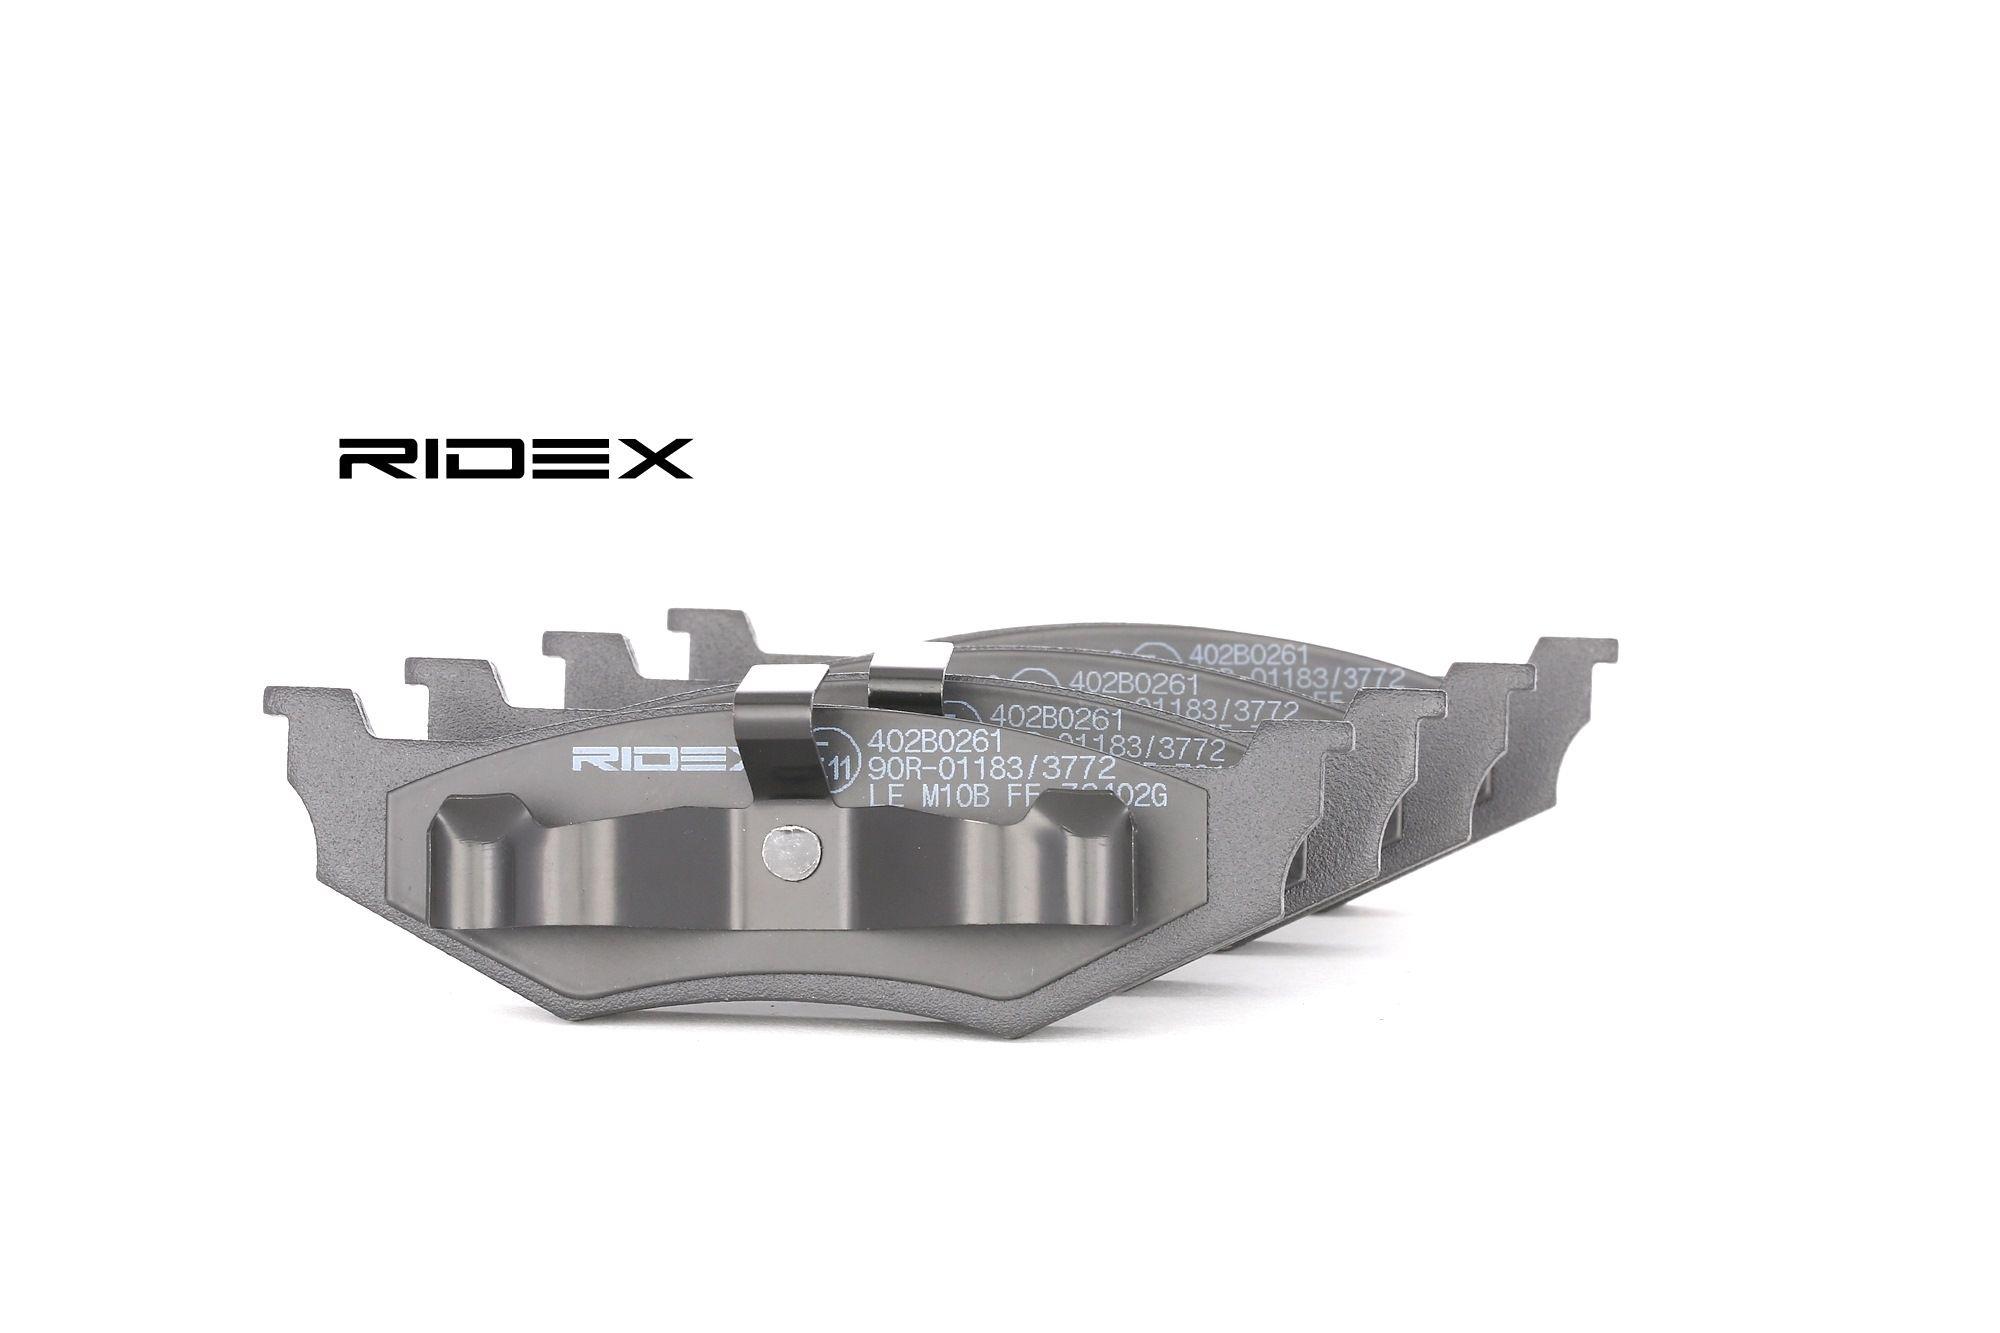 CHRYSLER PT CRUISER 2010 Bremsklötze - Original RIDEX 402B0261 Höhe 1: 39,8mm, Breite 1: 133,6mm, Dicke/Stärke 1: 17mm